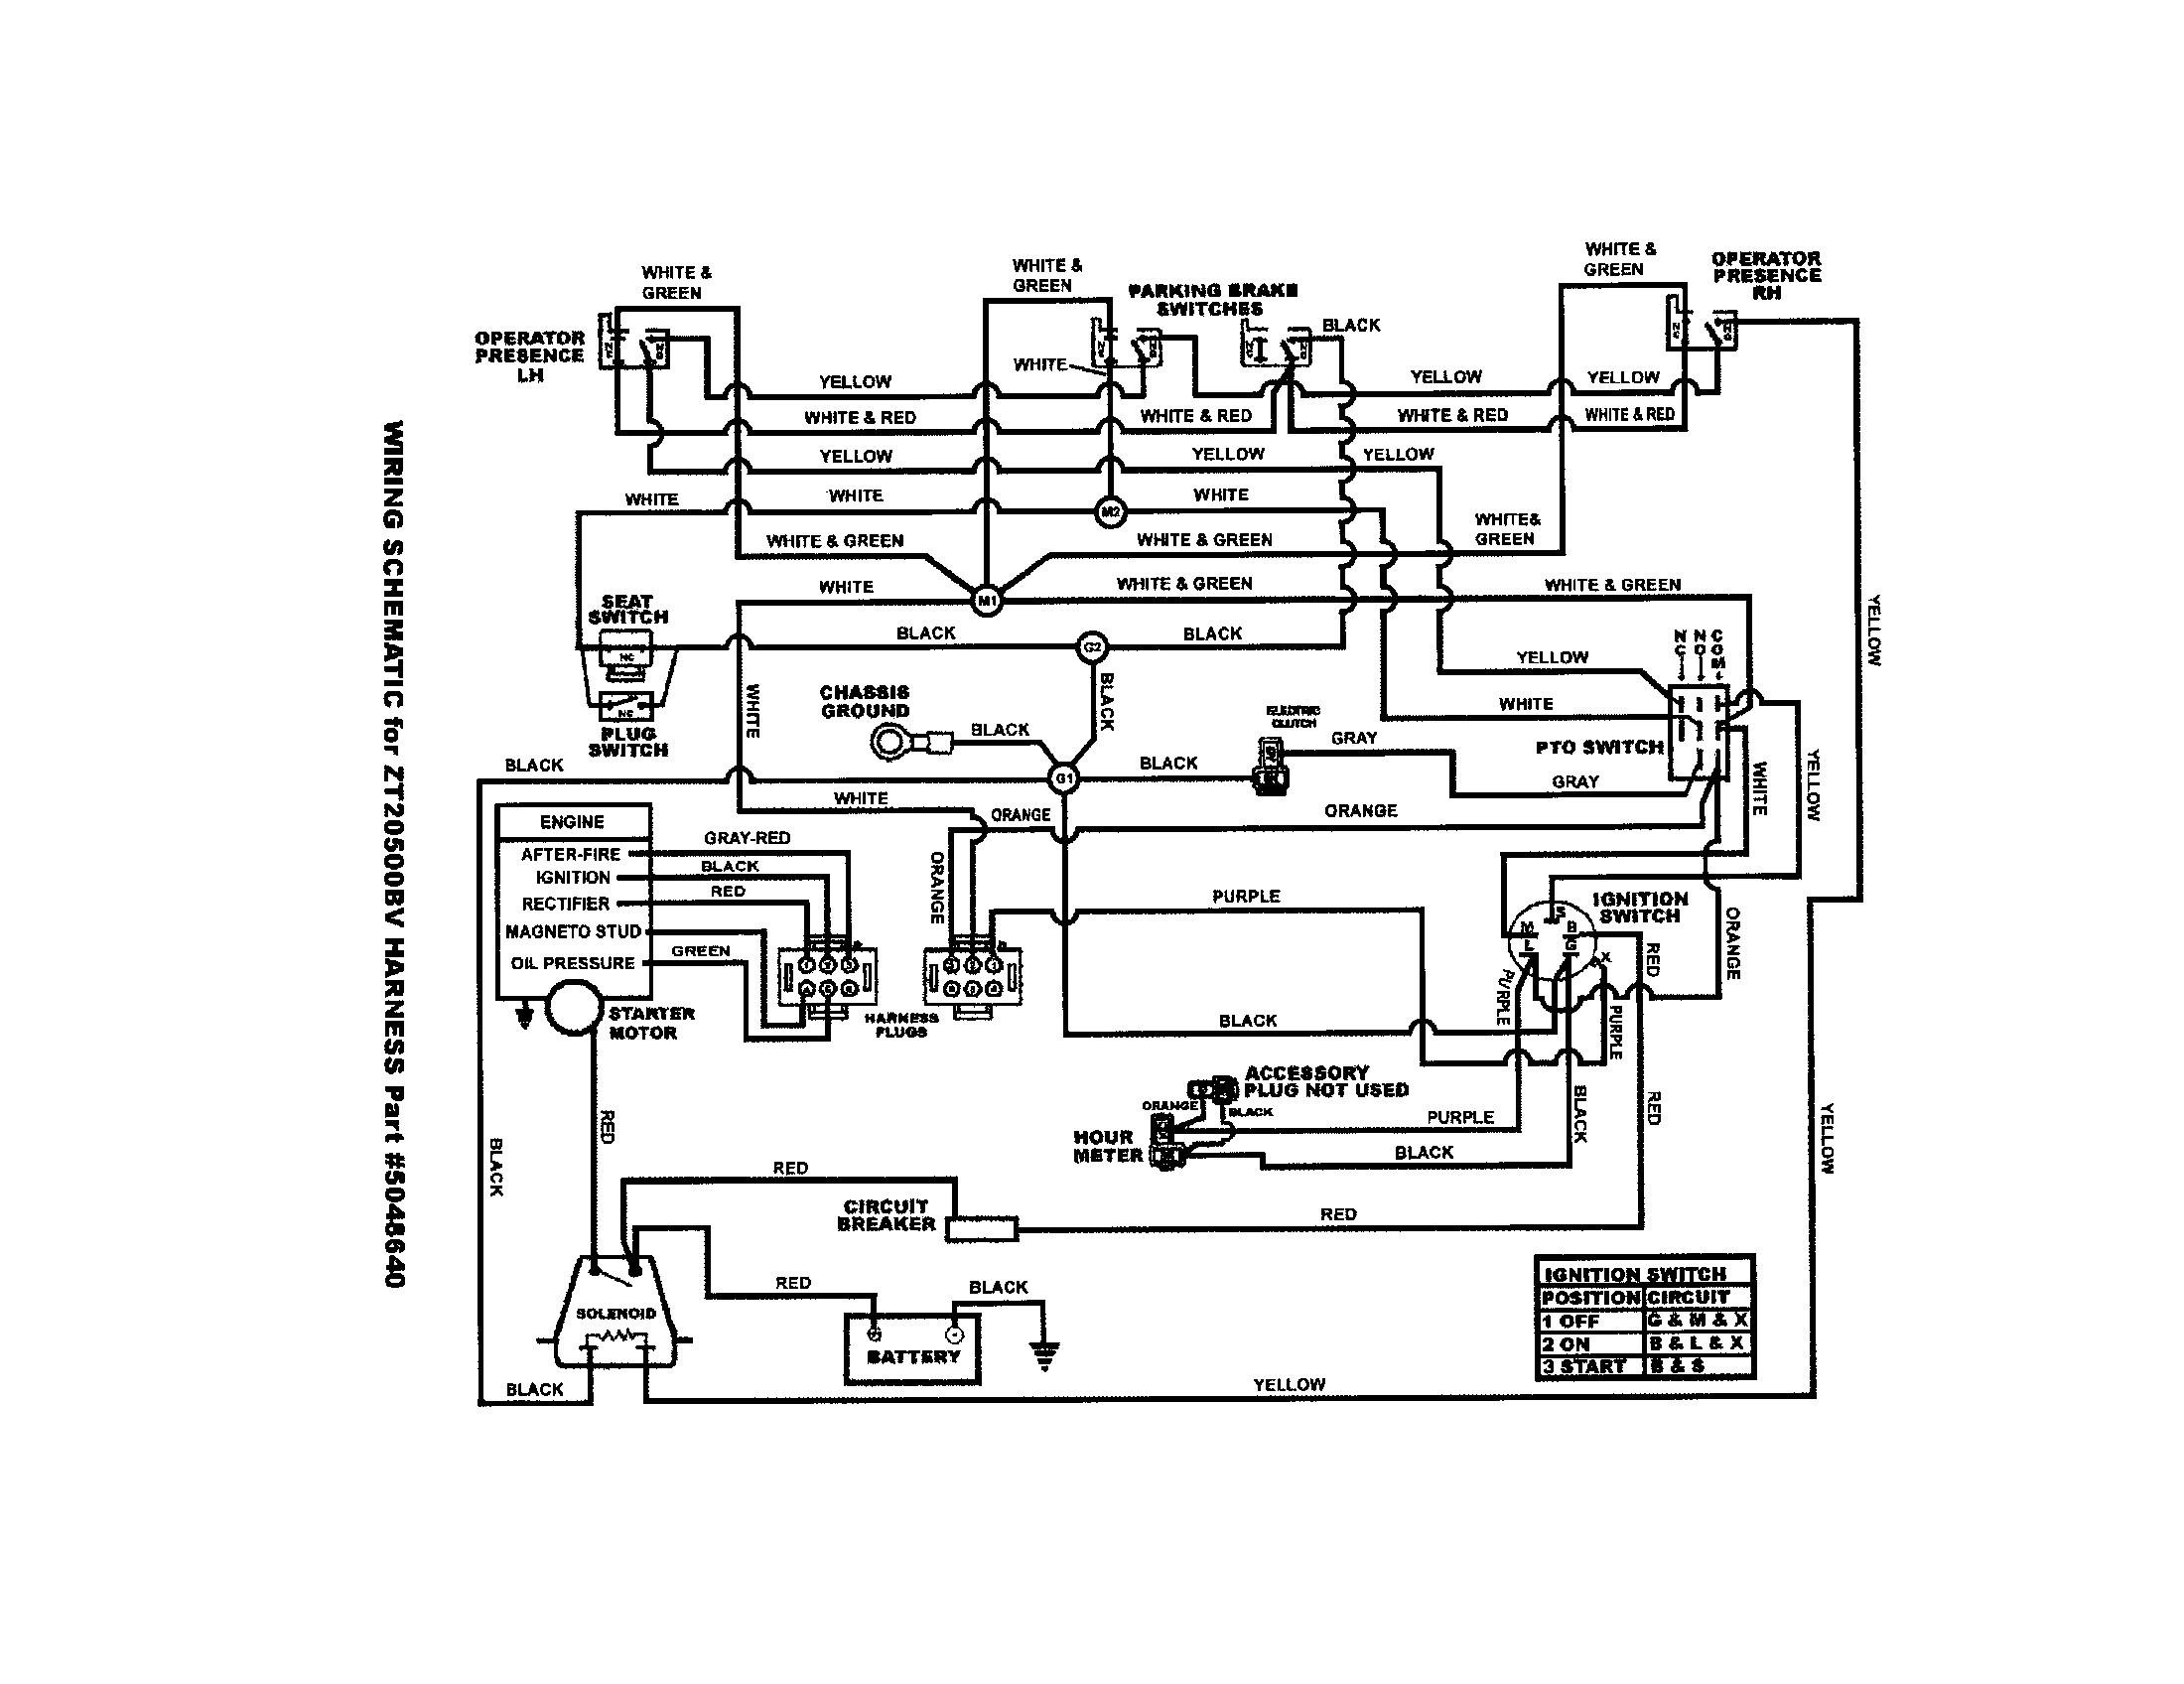 Kohler Engine Ignition Switch Wiring   Wiring Library - Kohler Command Wiring Diagram